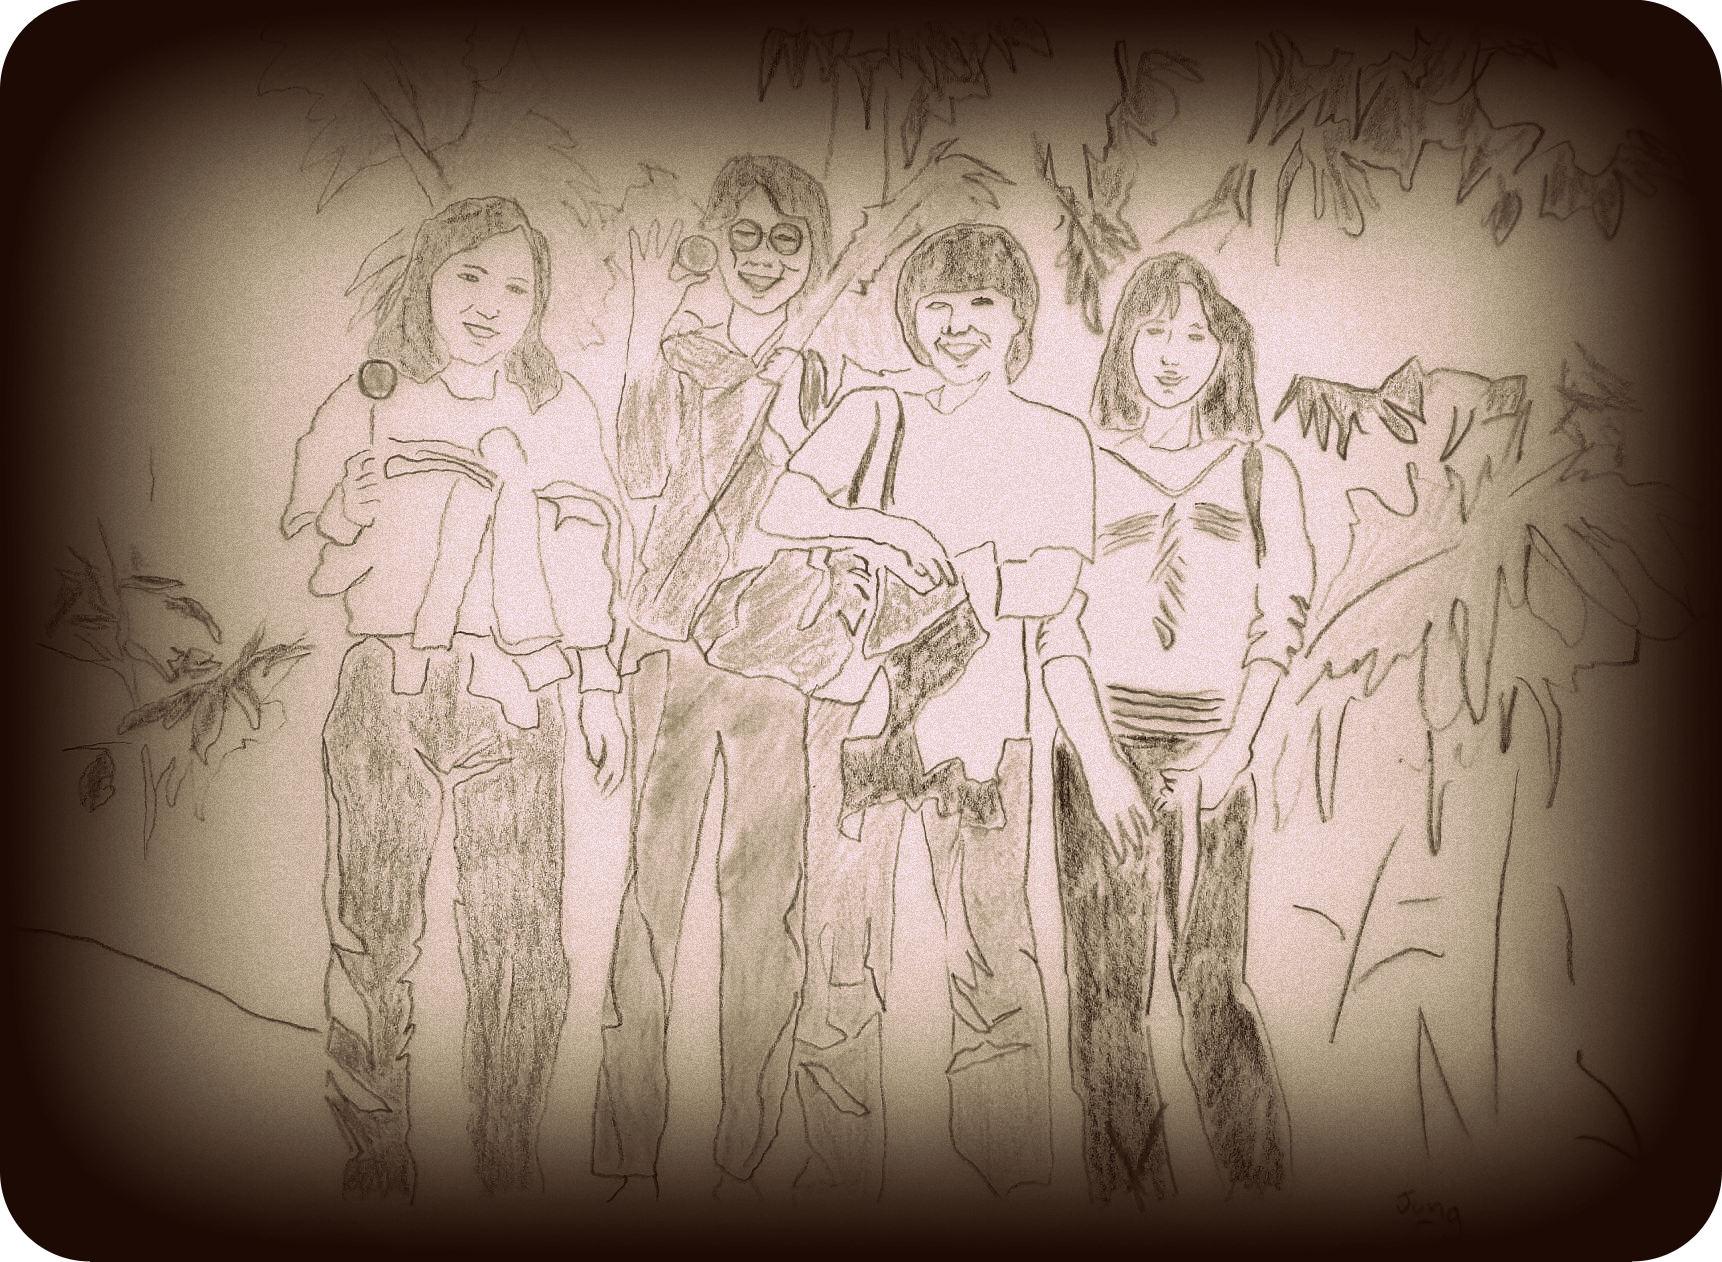 Memories of GuangDong GuangYa Middle School - Friends